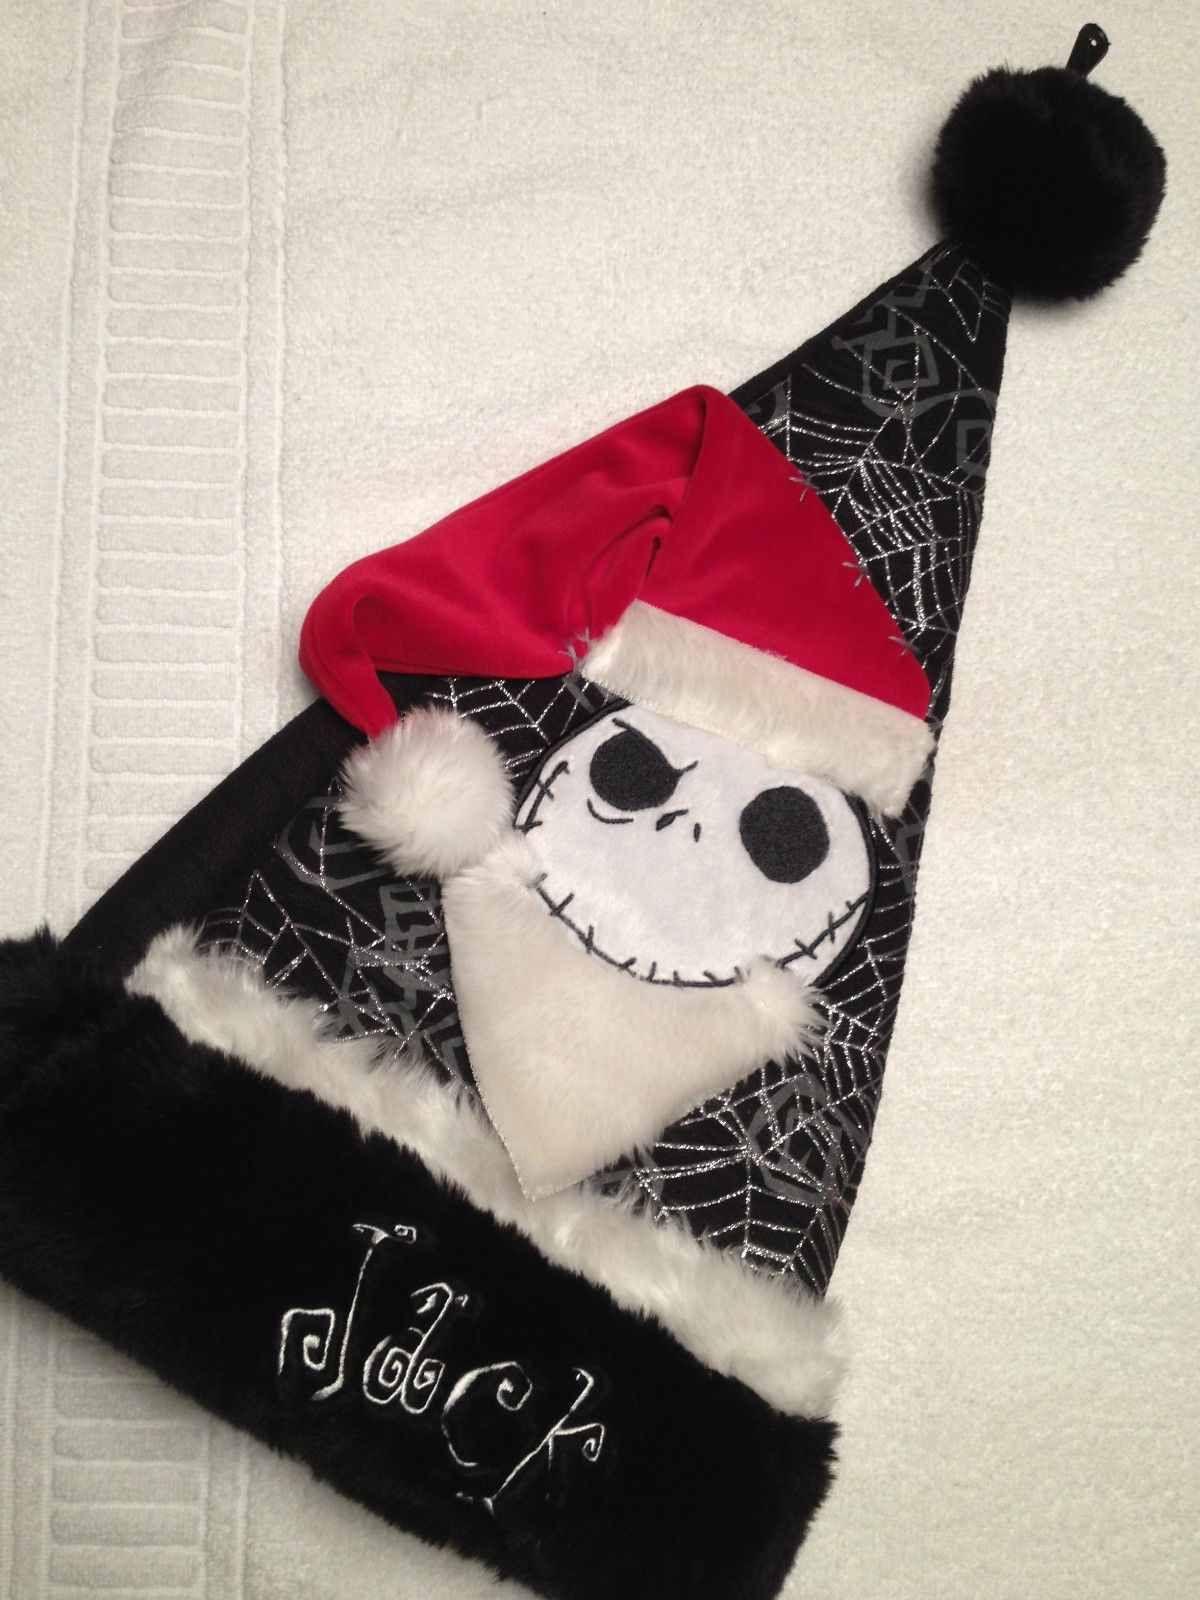 Jack Skellington Nightmare Before Christmas Haunted Mansion ...